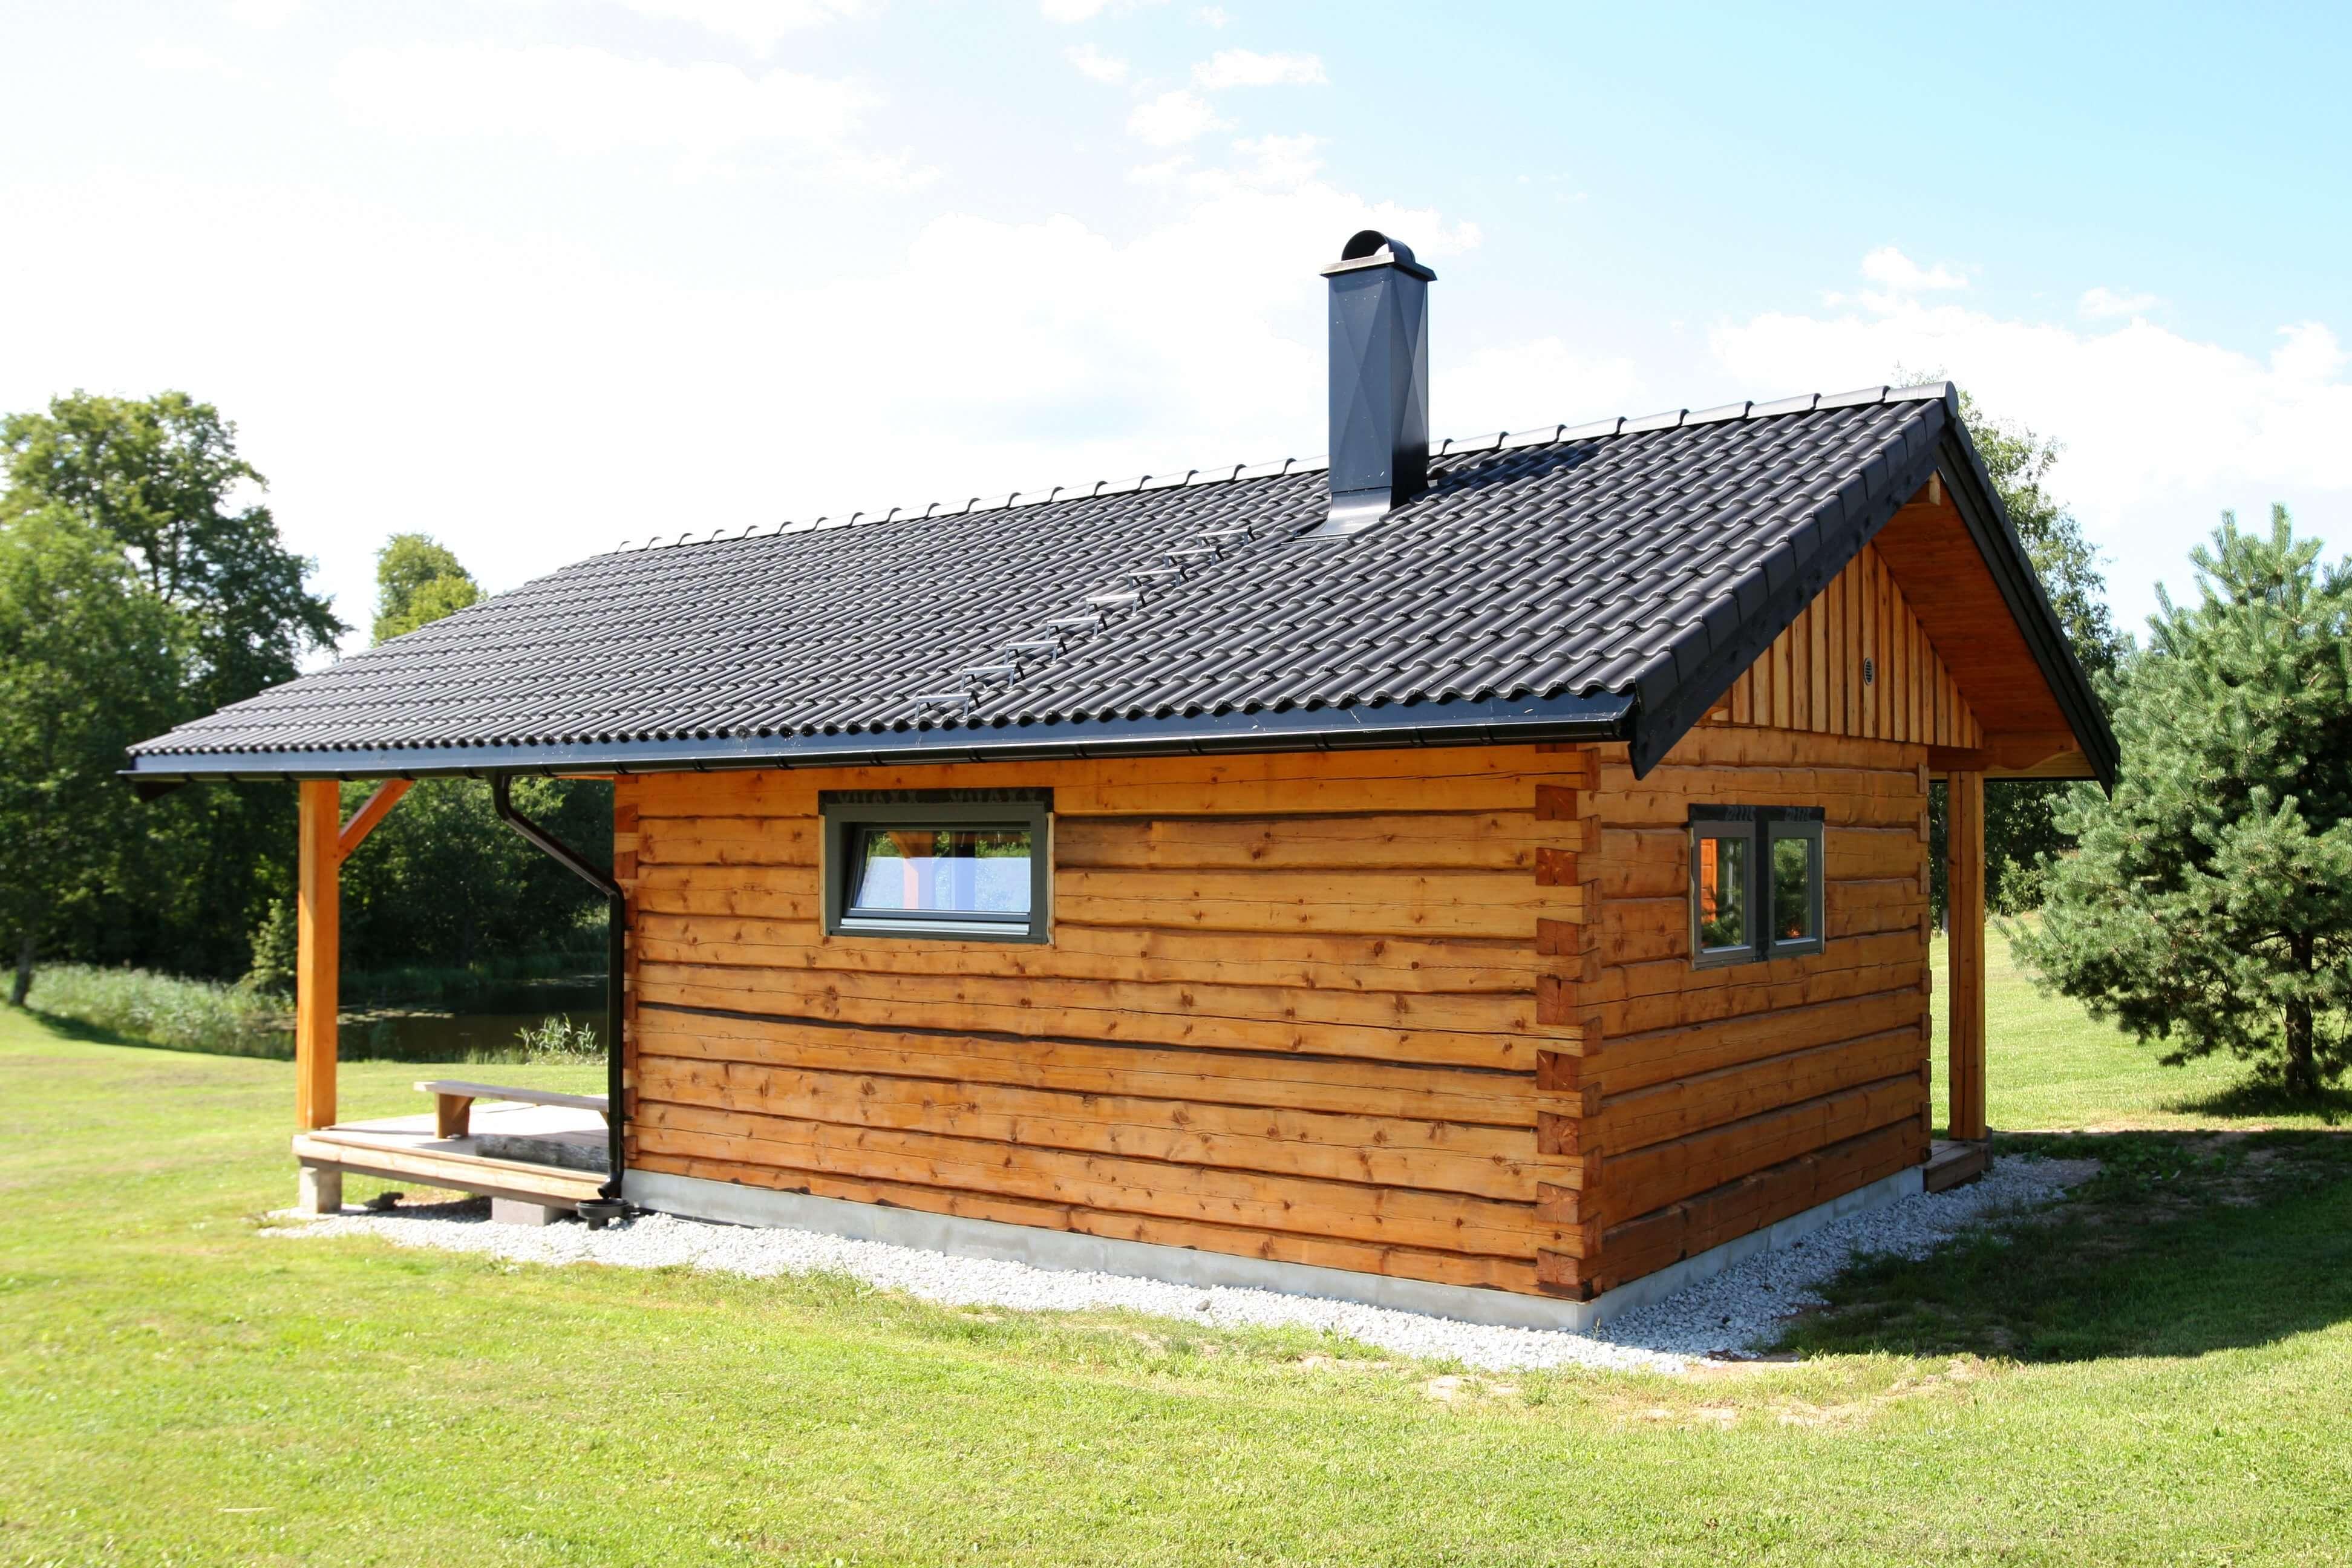 Log sauna with tiled roof